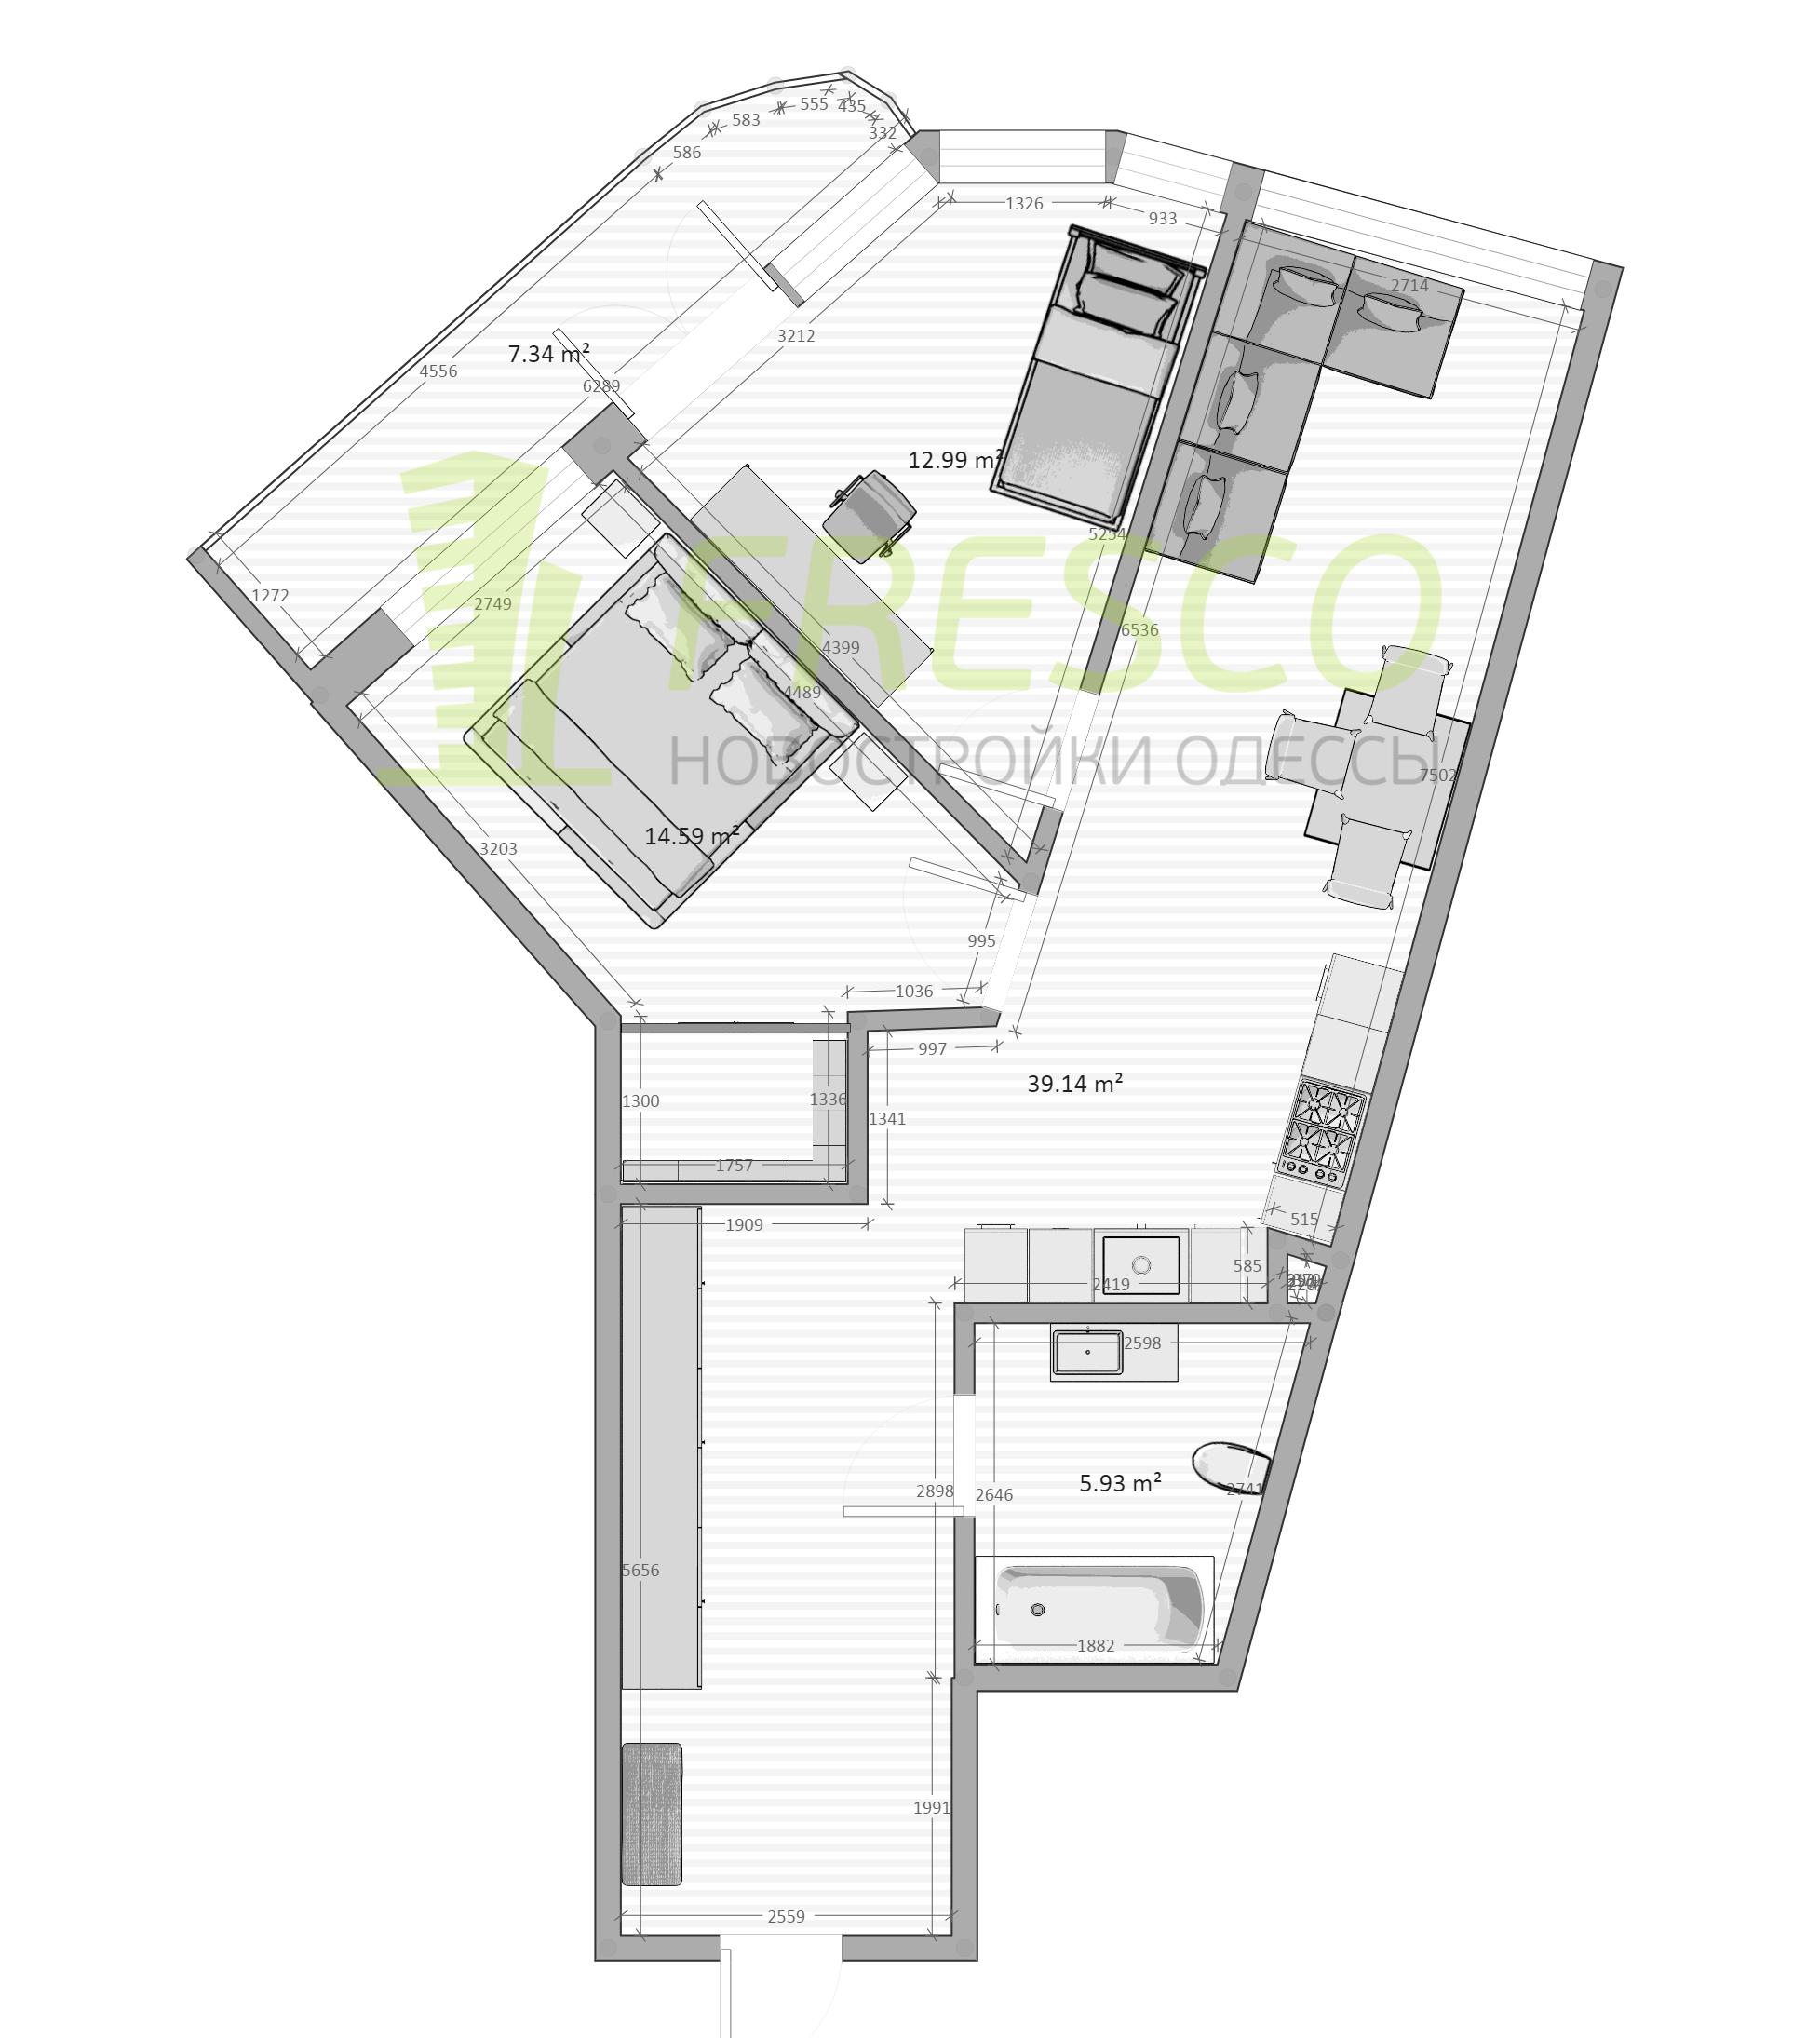 Двухкомнатная - ЖК Kandinsky Residence (Кандинский)$100295Площадь:75,24m²